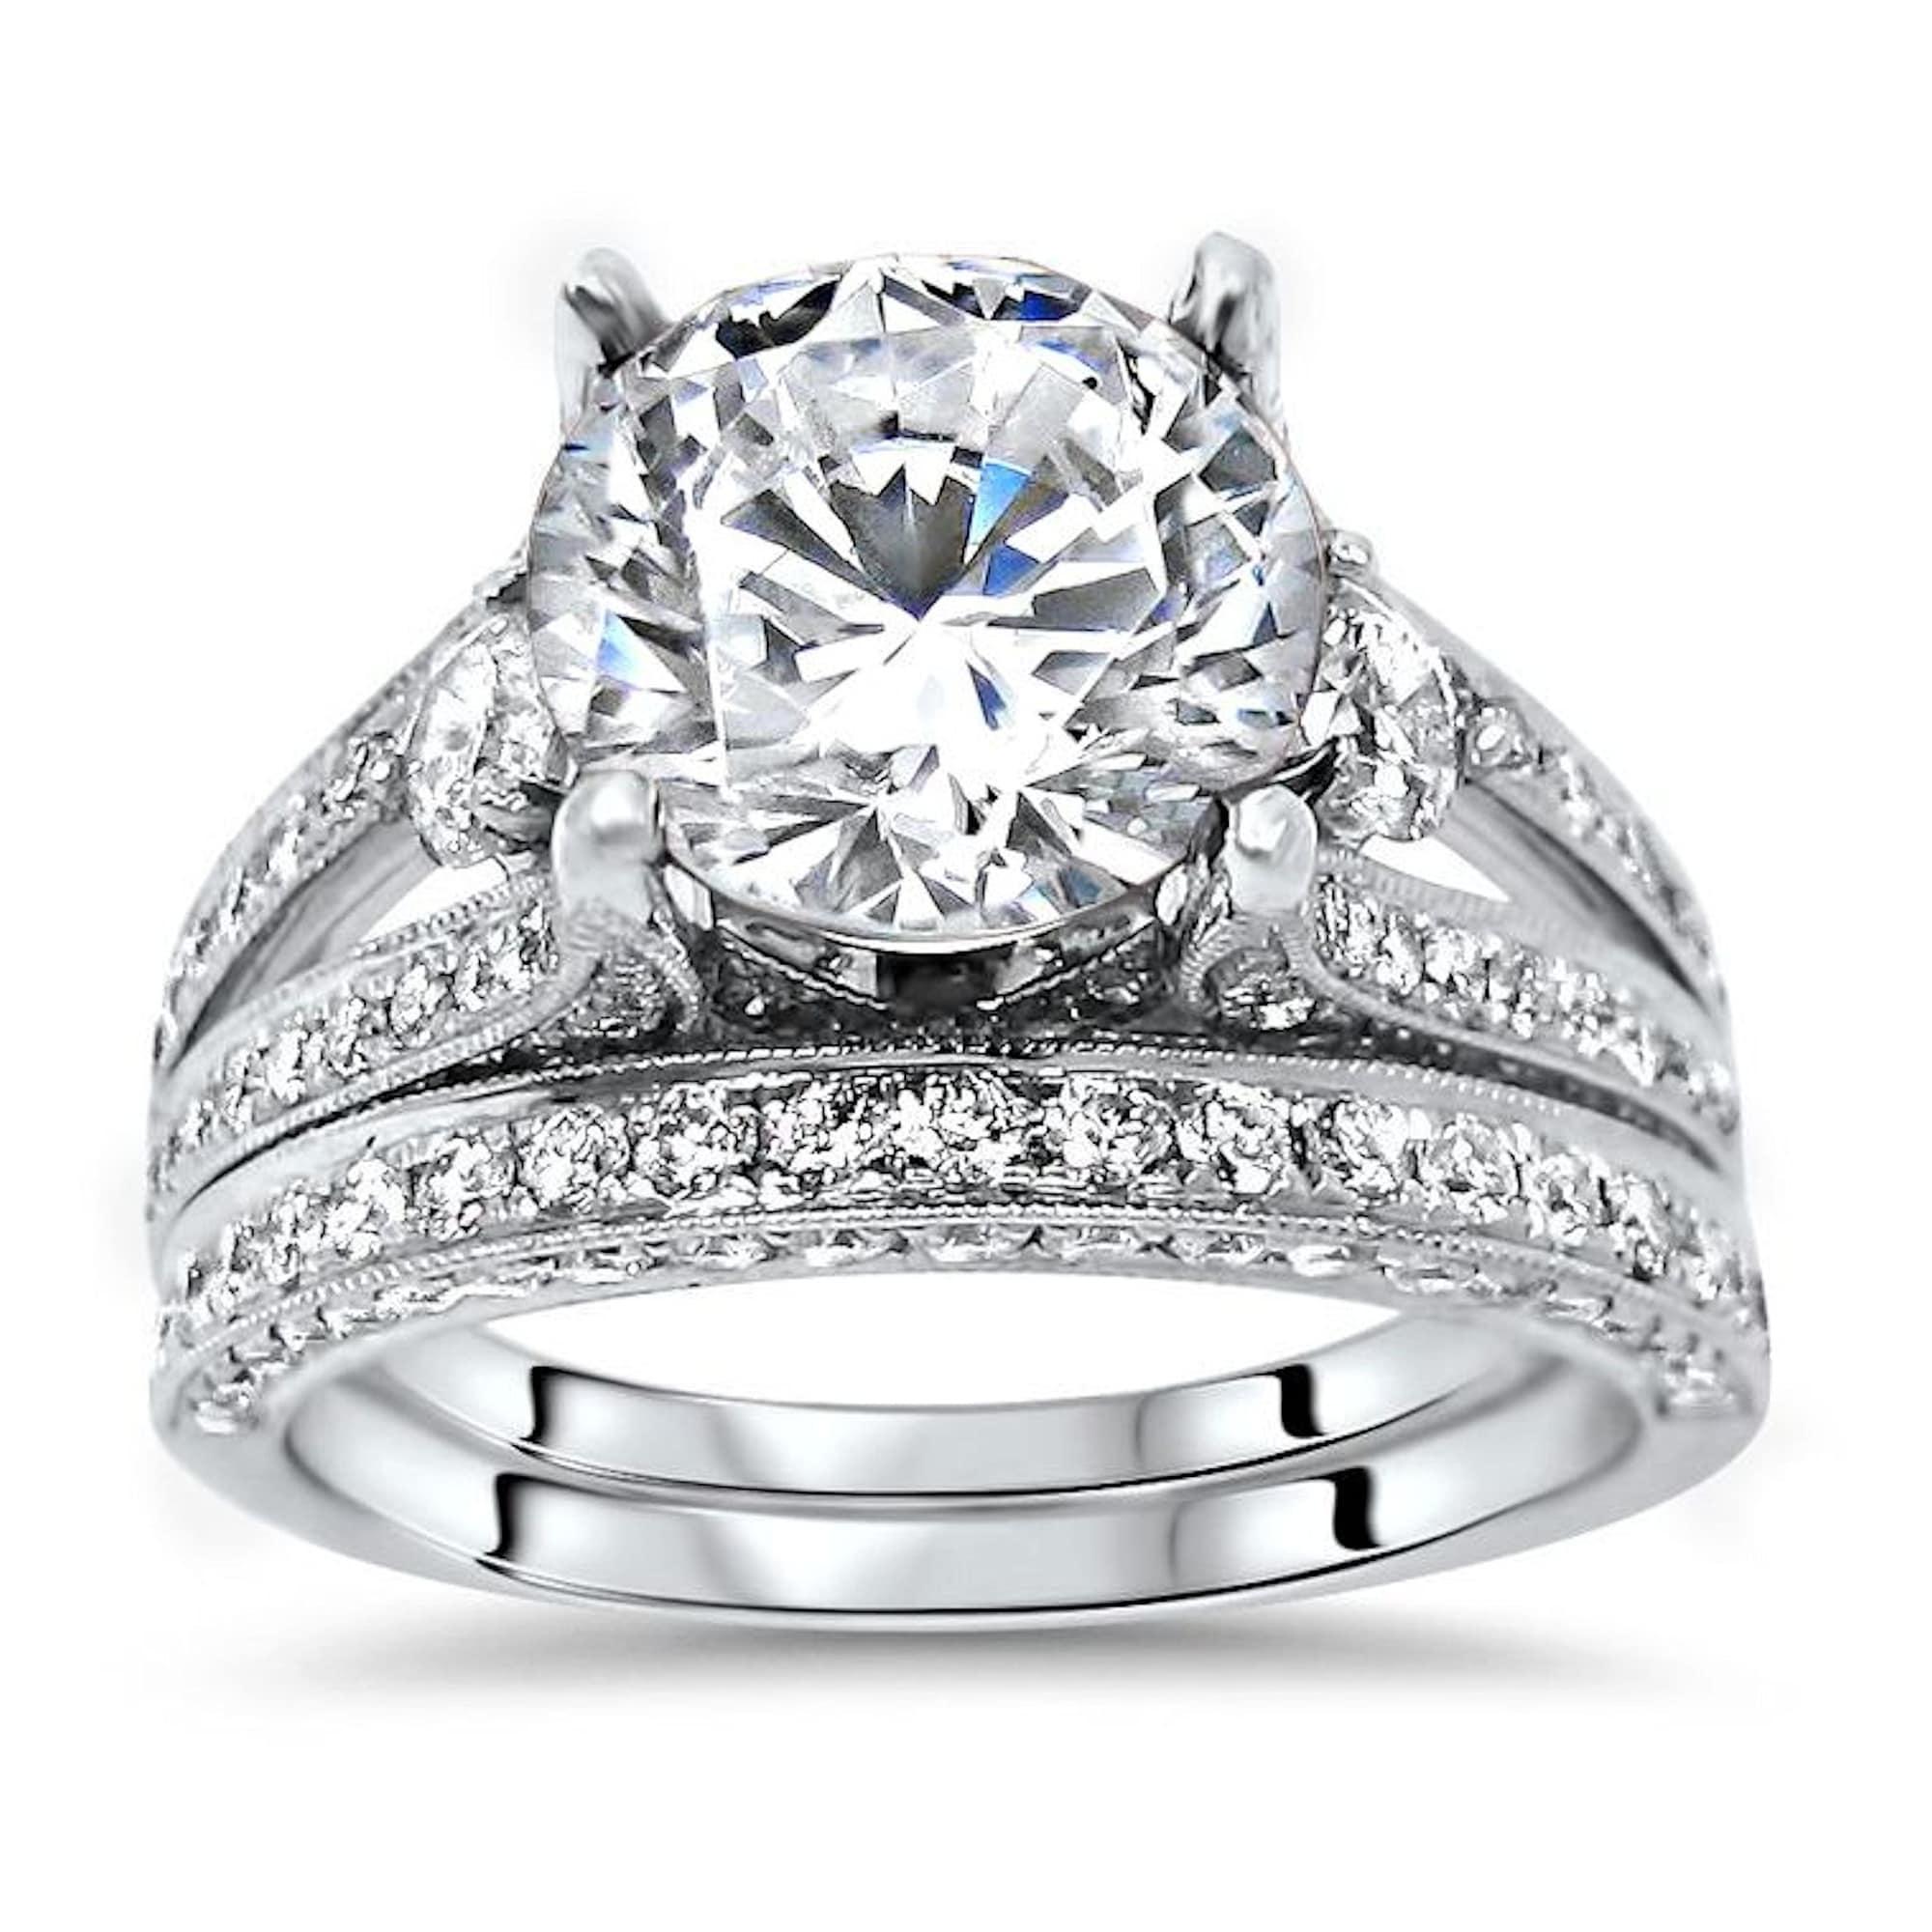 Engagement Ring Gift For Mum 1.60 Ct White Round Moissanite Halo Wedding Ring,Moissanite Ring in 10KT Yellow Gold Ring